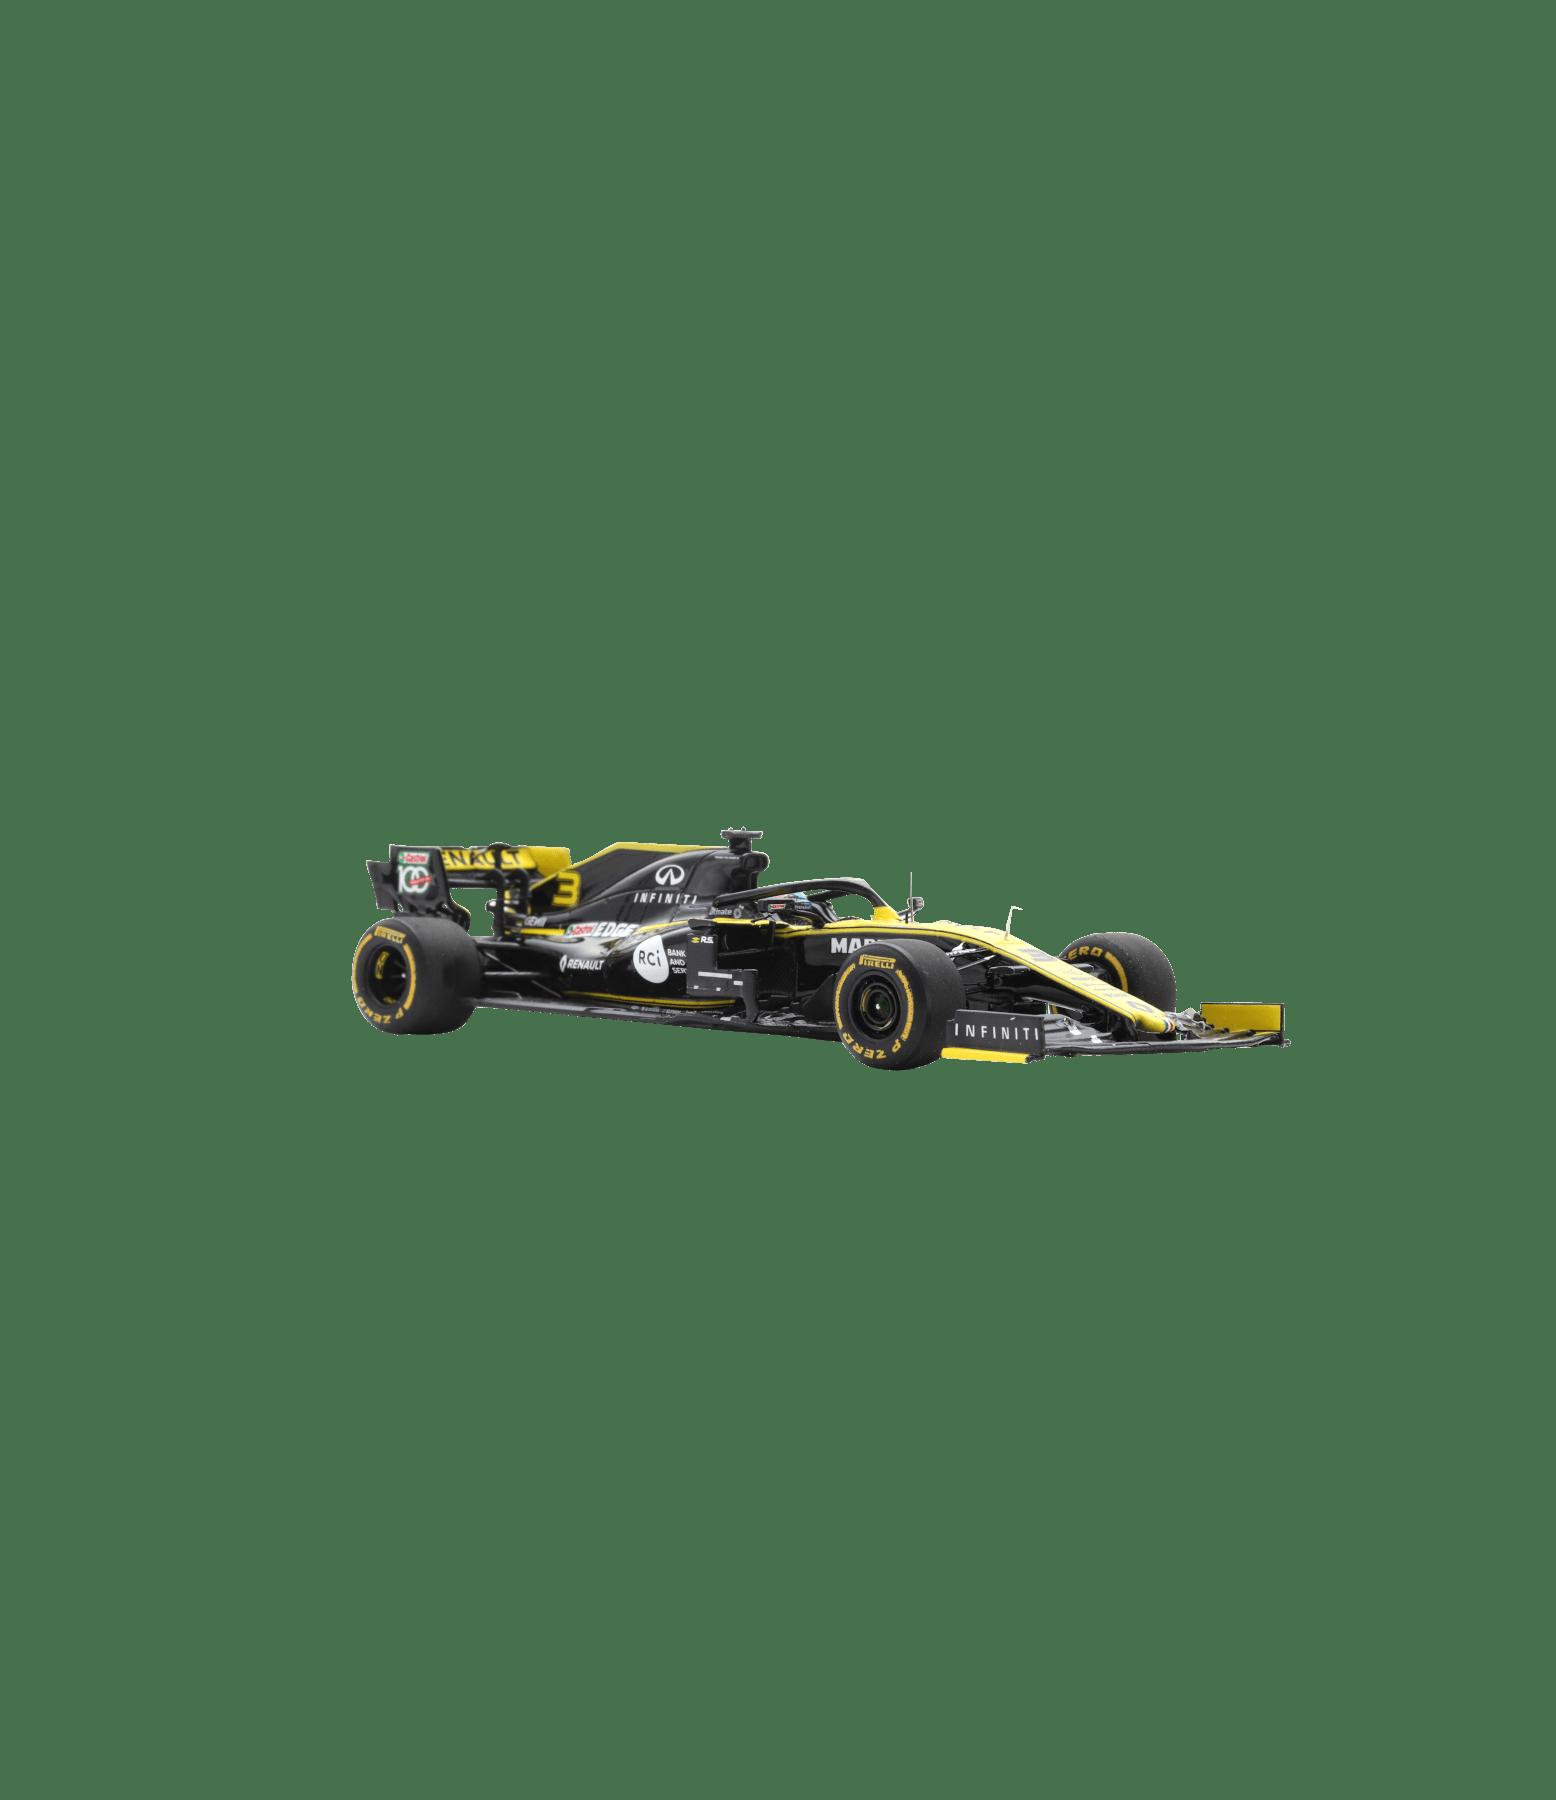 RENAULT F1® Team 2019 R.S.19 #3 Daniel Ricciardo Model Car